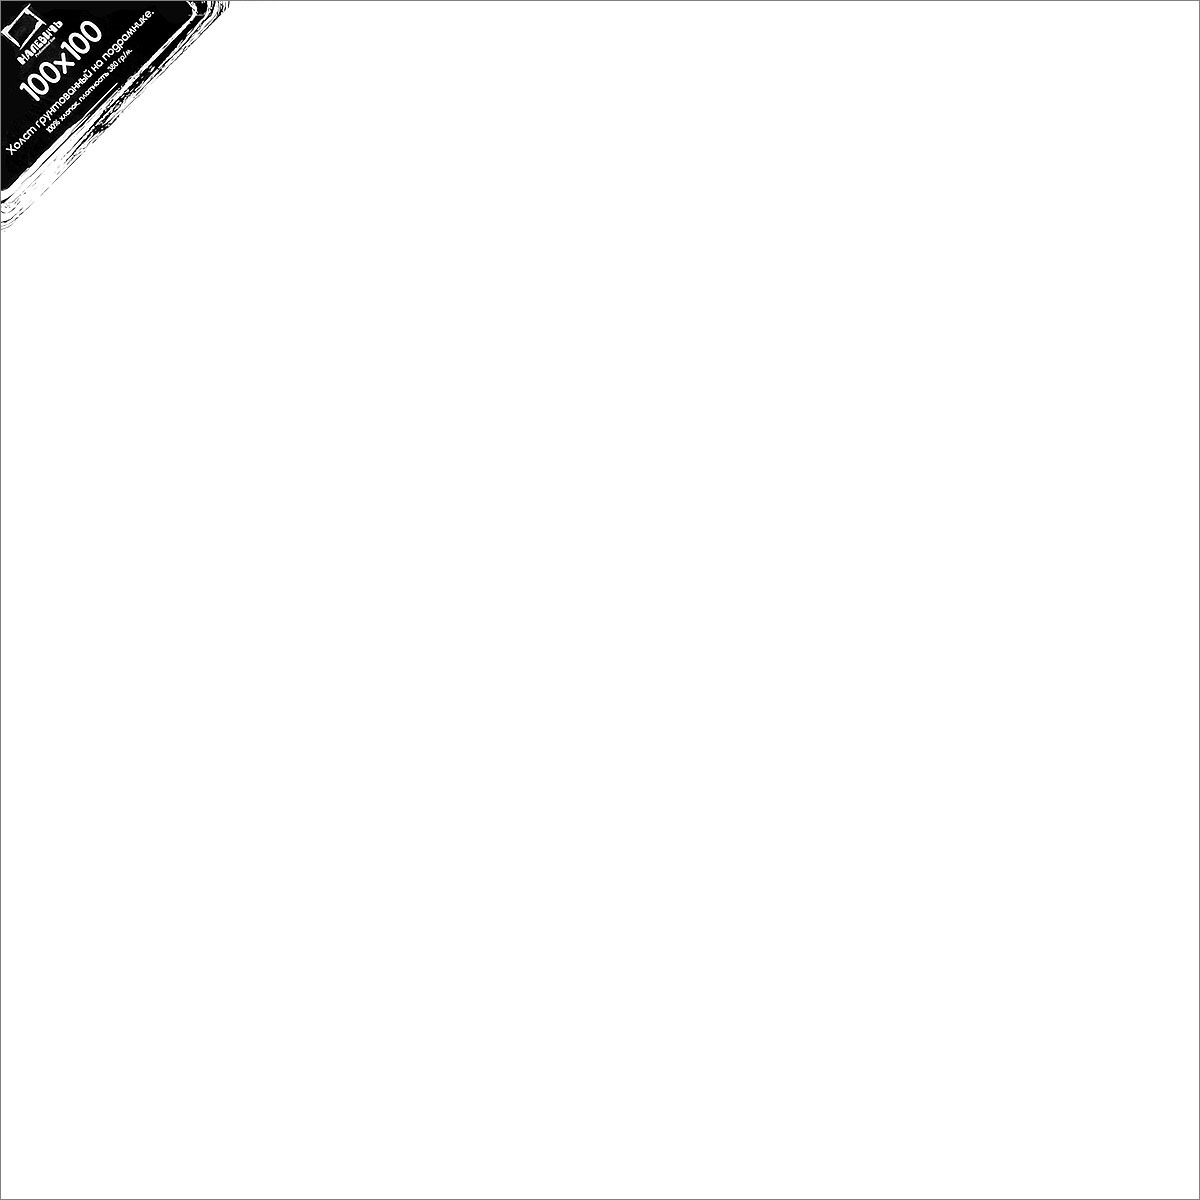 Малевичъ Холст на подрамнике 100 см x 100 см 380 г/м2